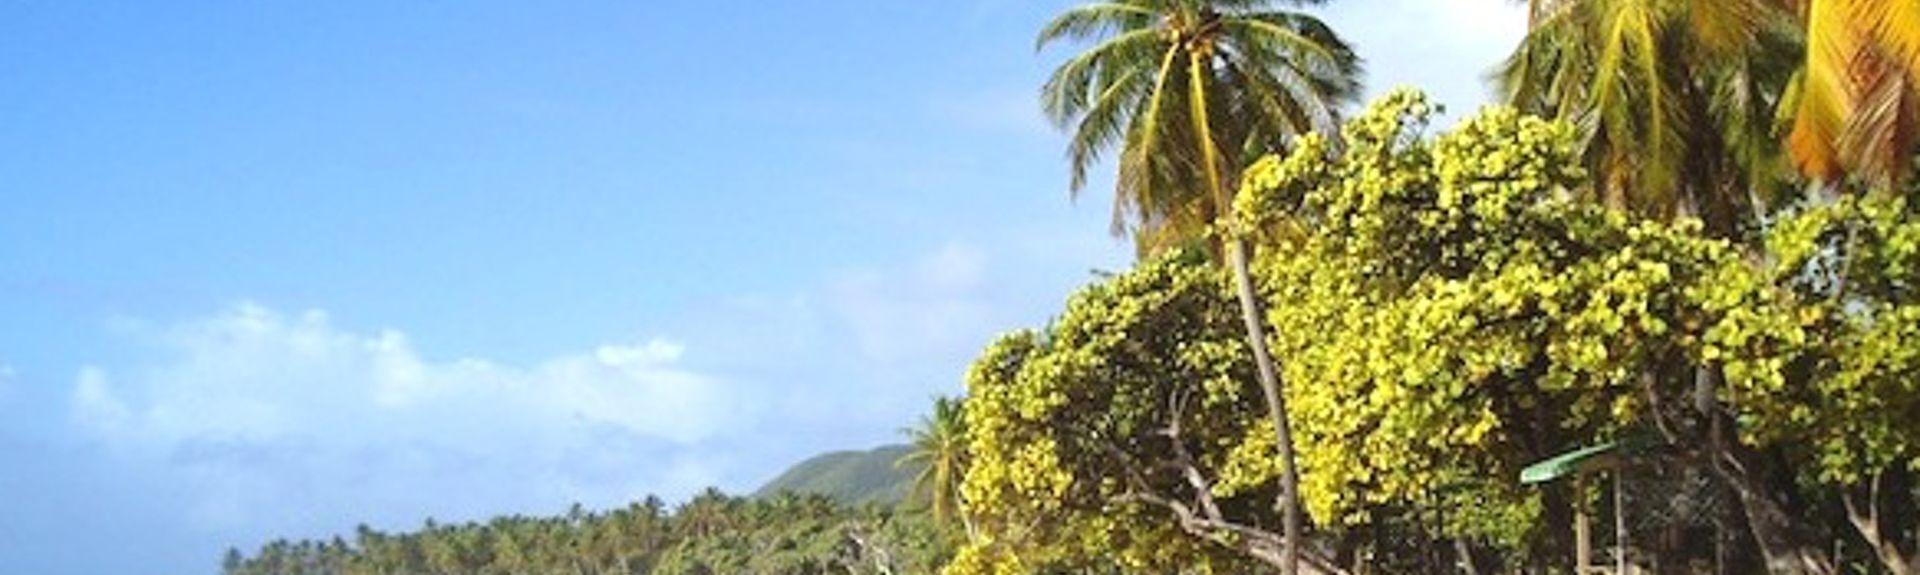 Grand-Bourg, Guadeloupe